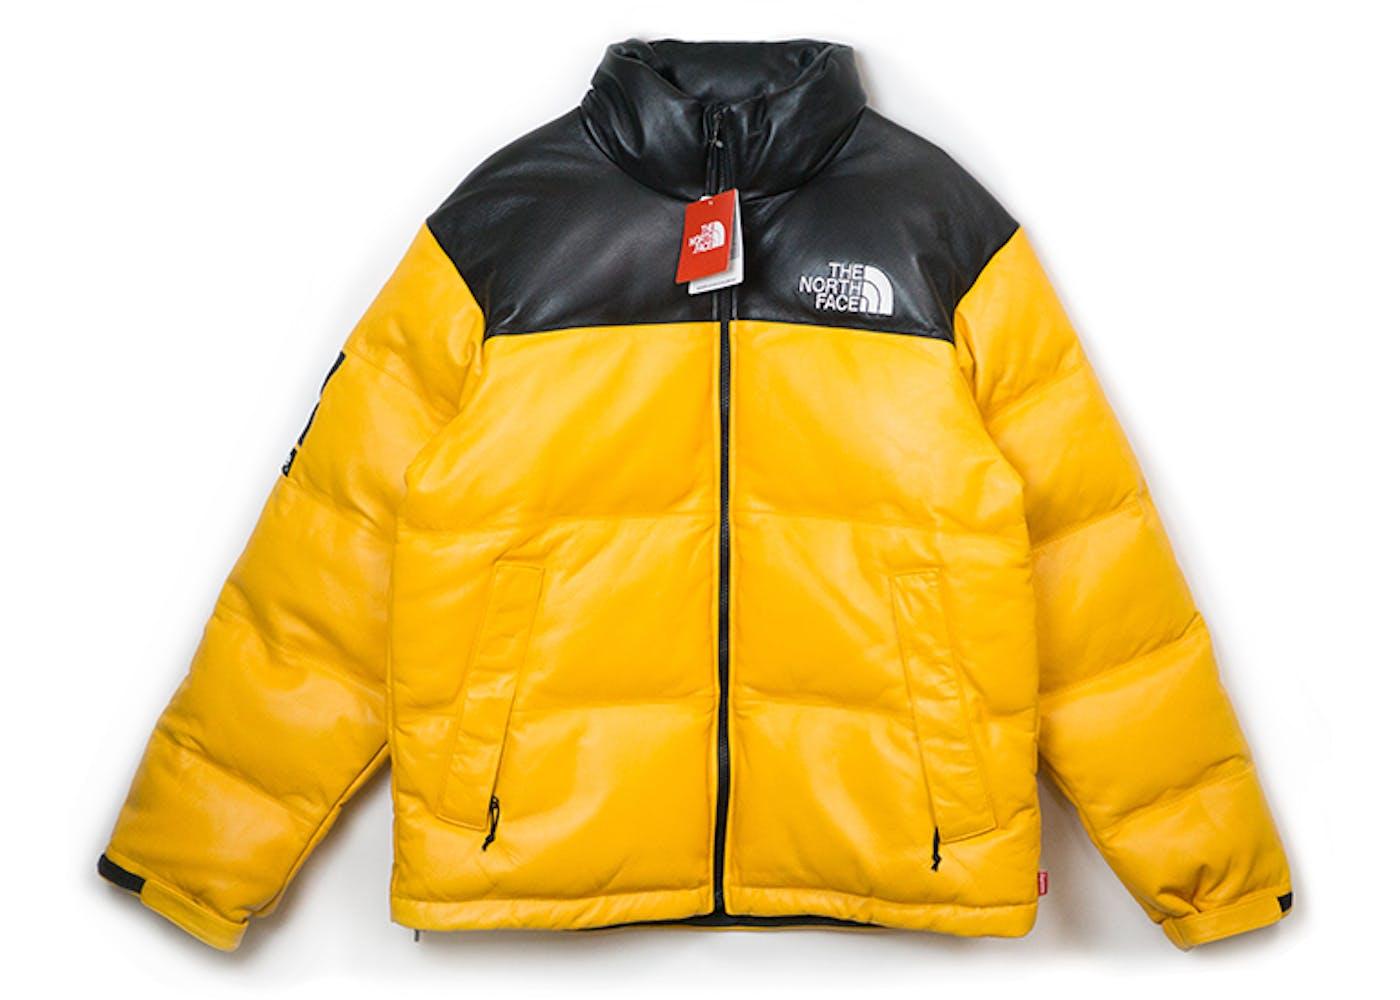 The North Face Women's Osito 2 Fleece Jacket feels like a high-loft, plush, fuzzy fleece blanket rather than a lame, thin beach-towel-esque burrfalkwhitetdate.ml: $